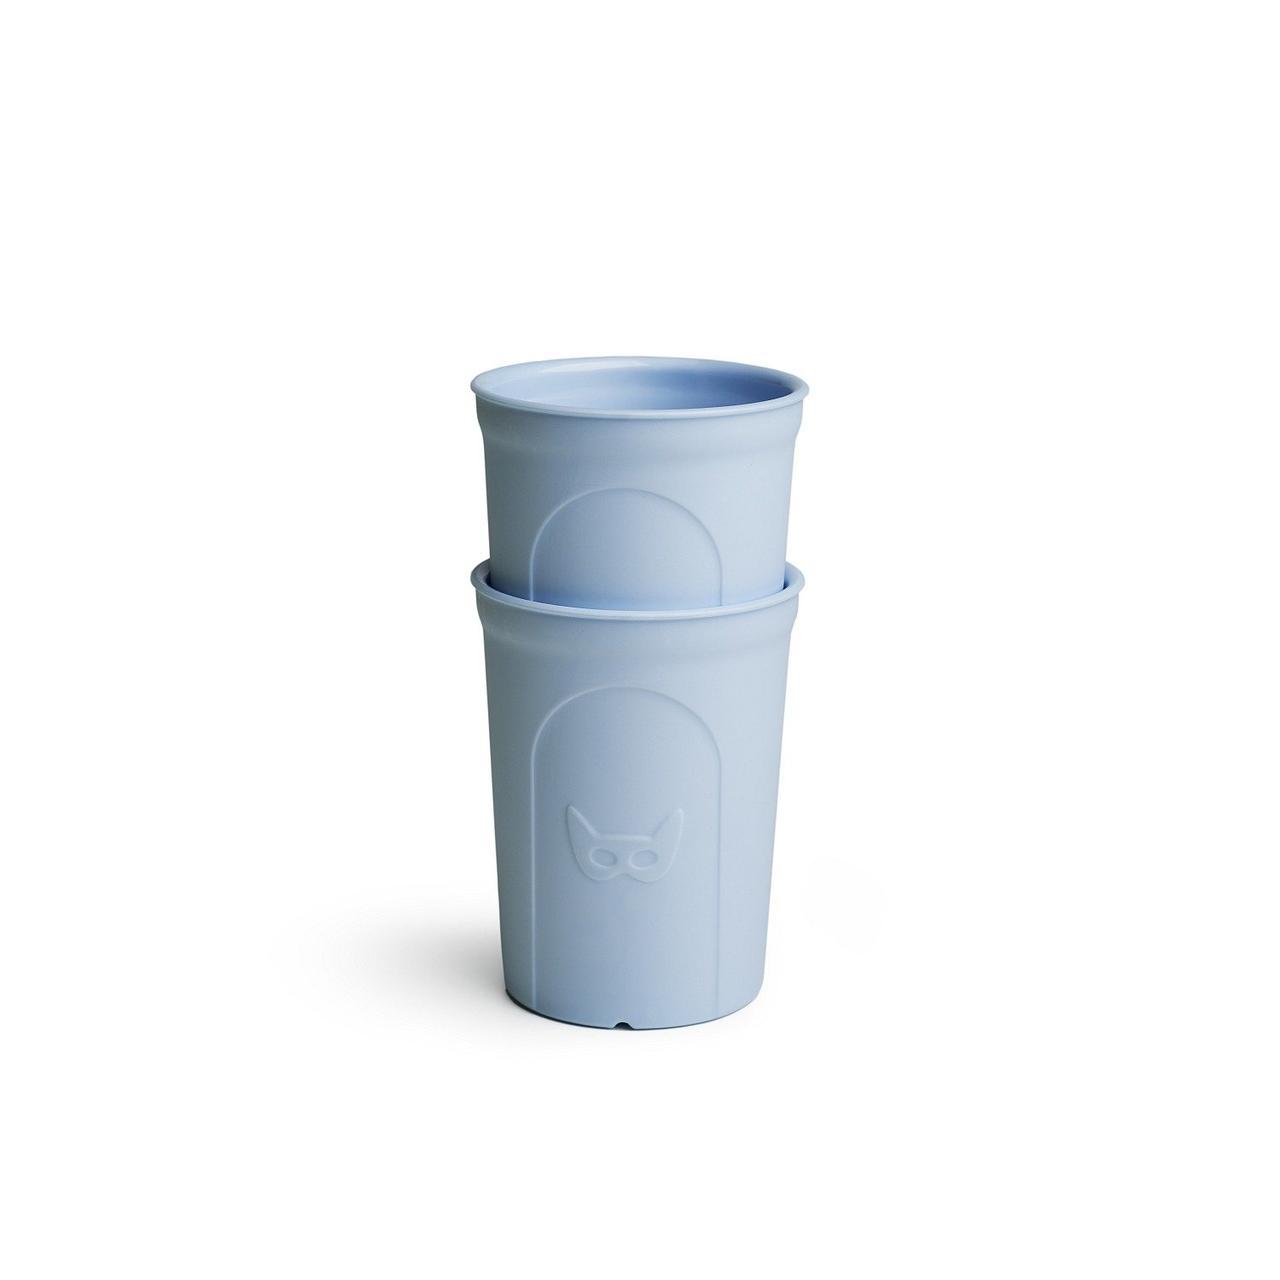 Herobility - Чашка HeroEcoGlass, 2 шт, цвет синий